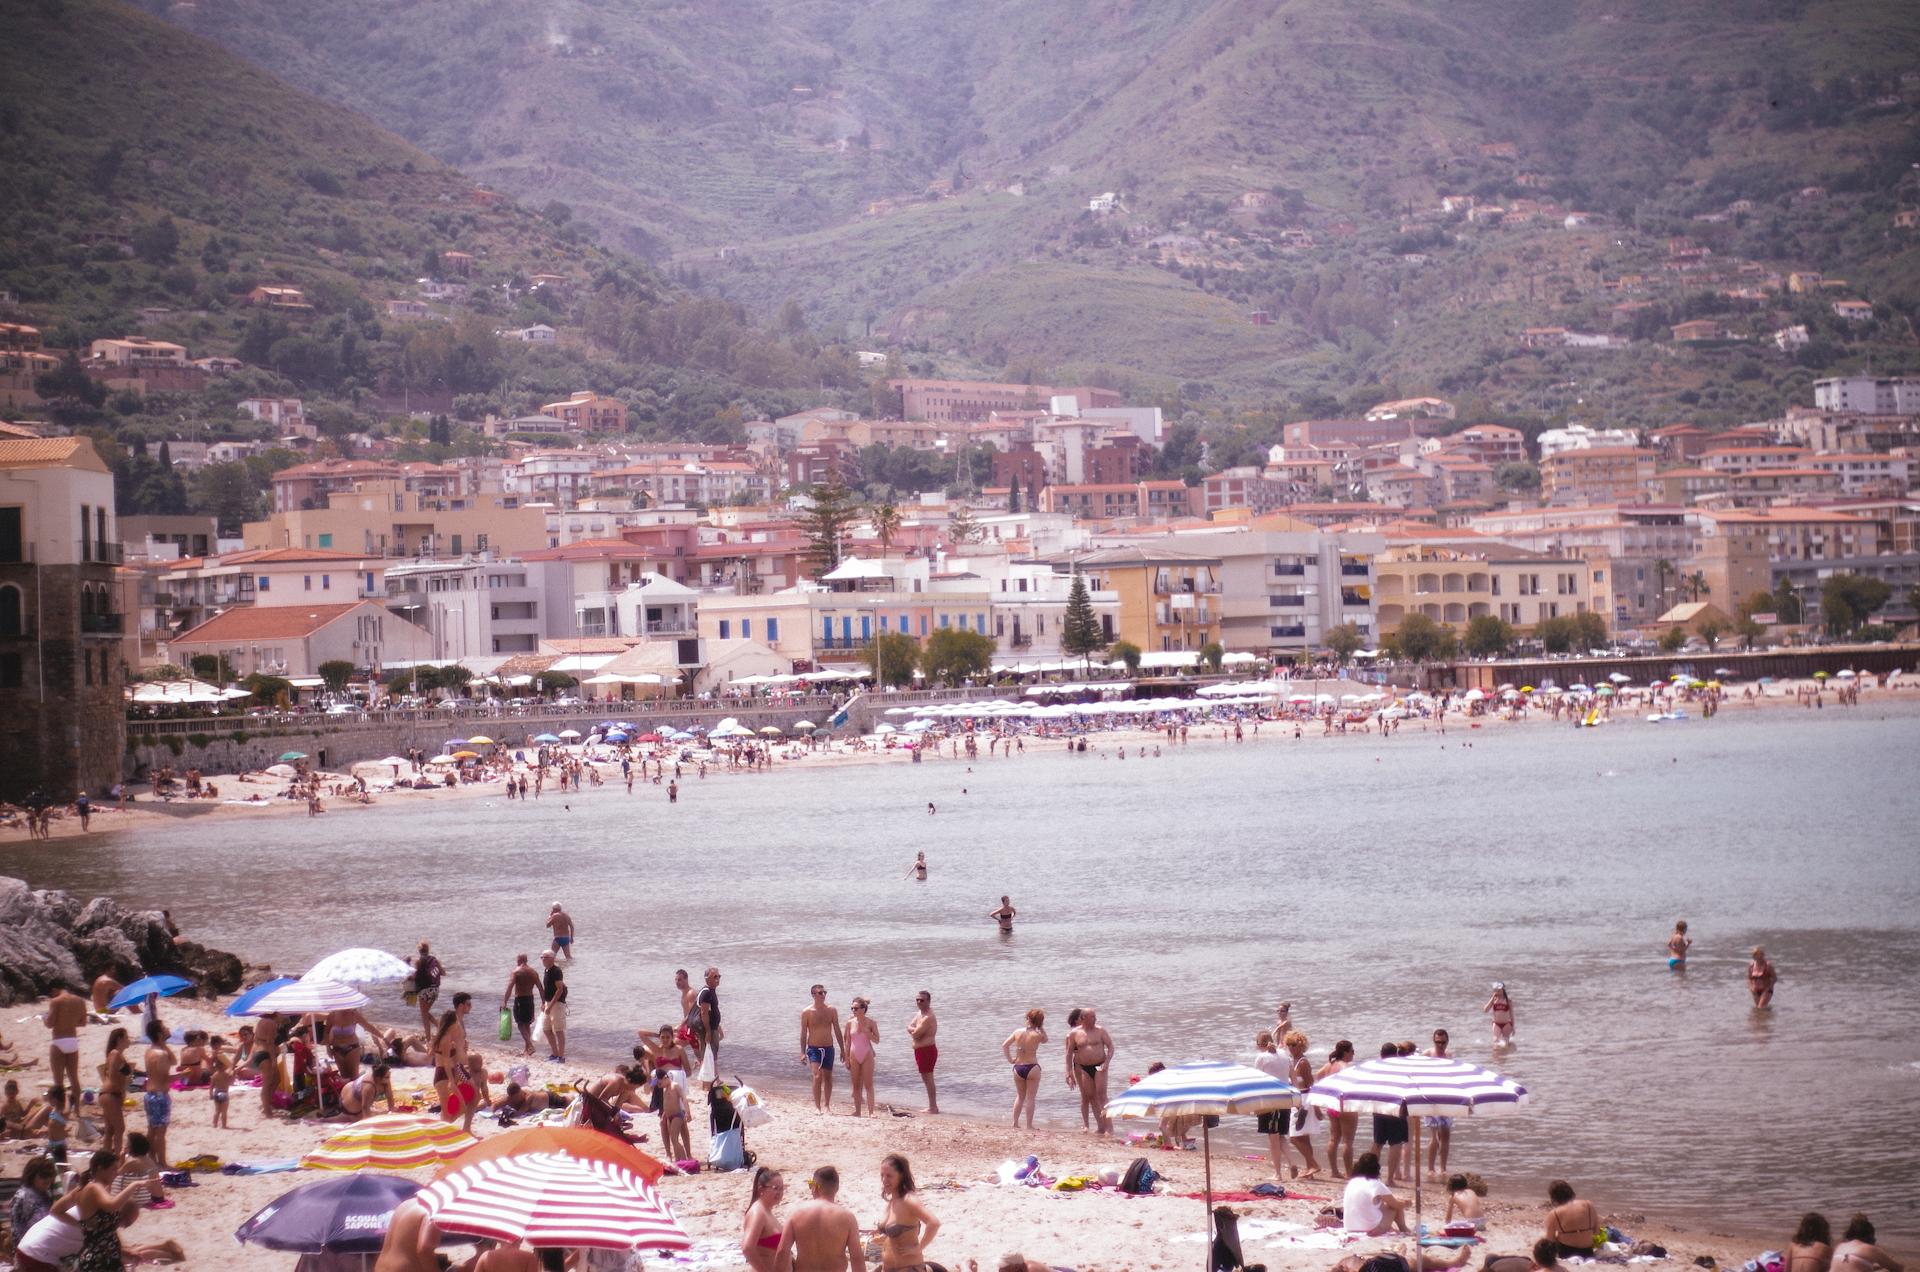 SICILY - Cefalu